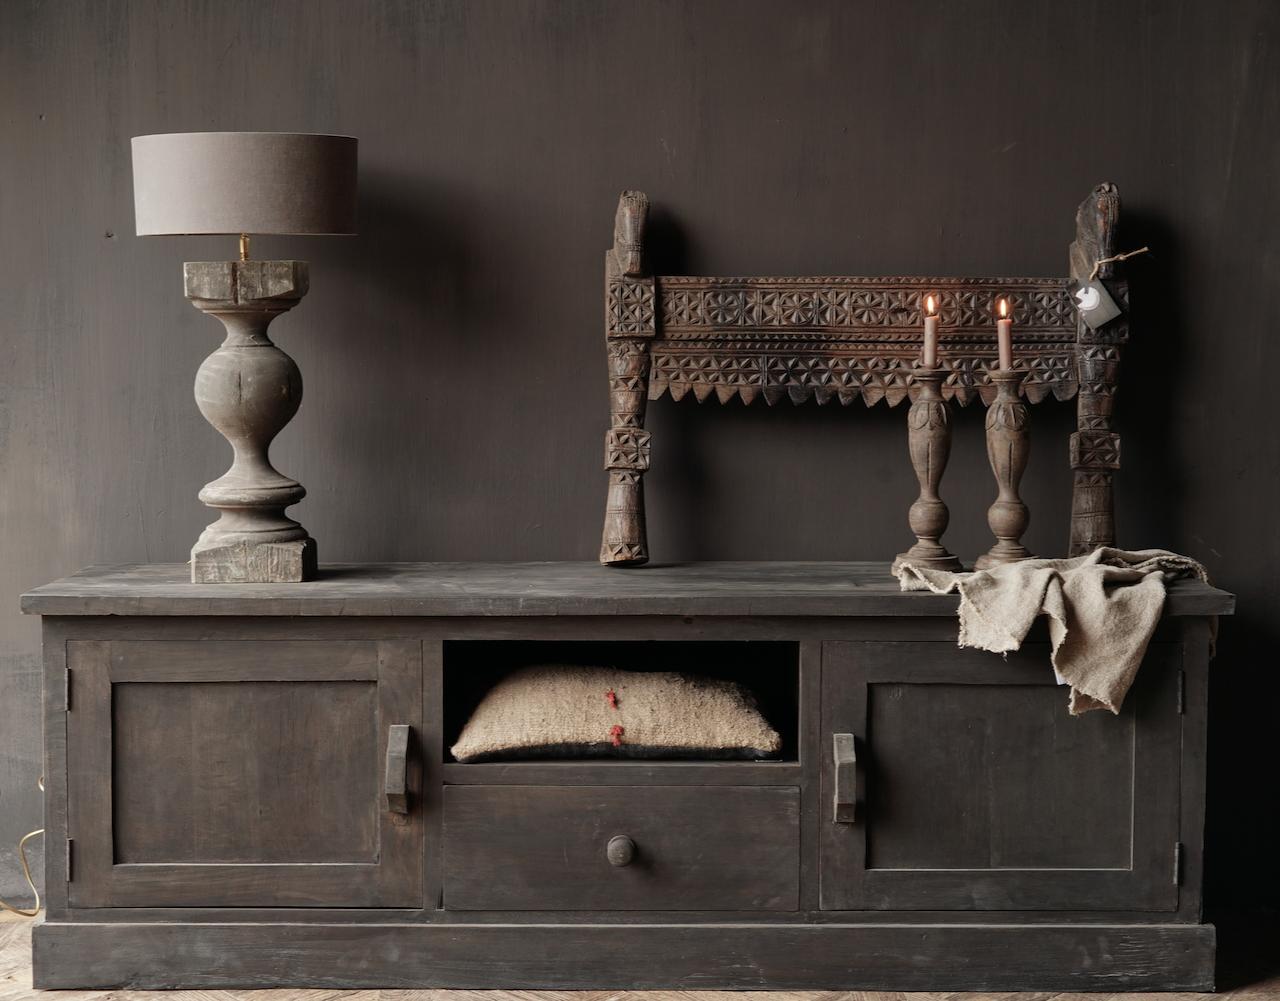 Stoer Tv Furniture / sideboard made of old wood-3